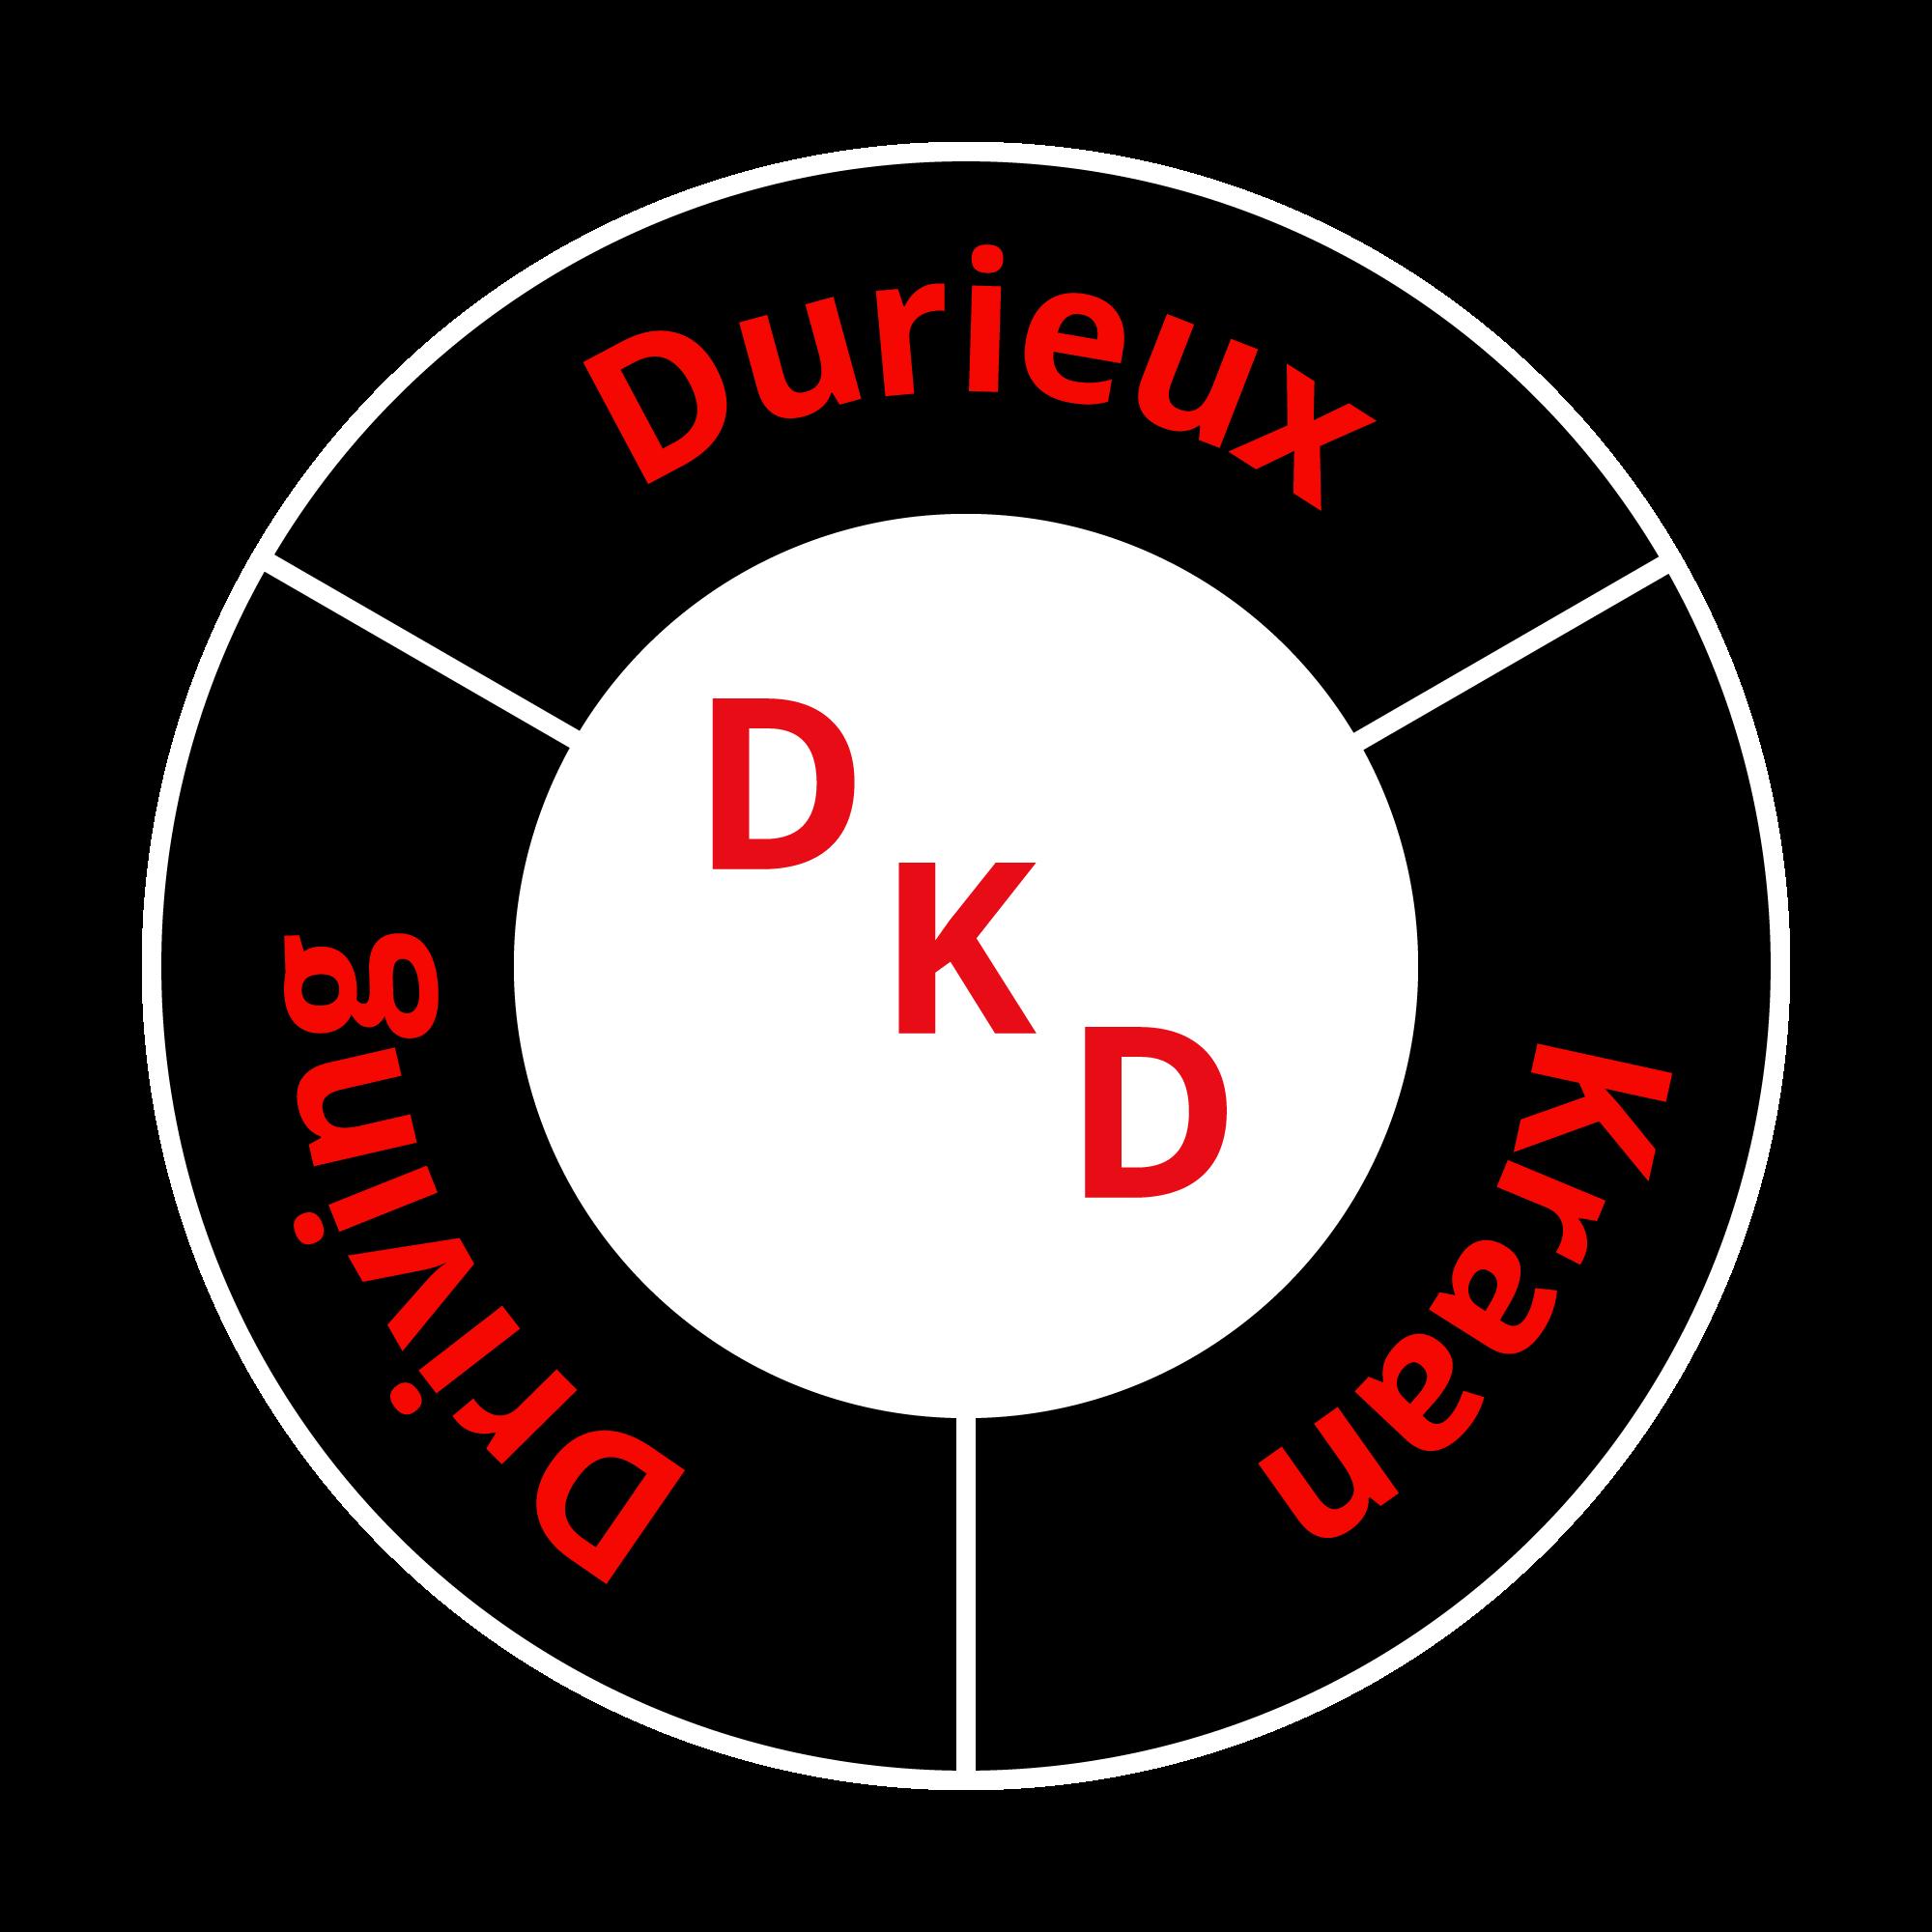 Durieux Kraan Driving